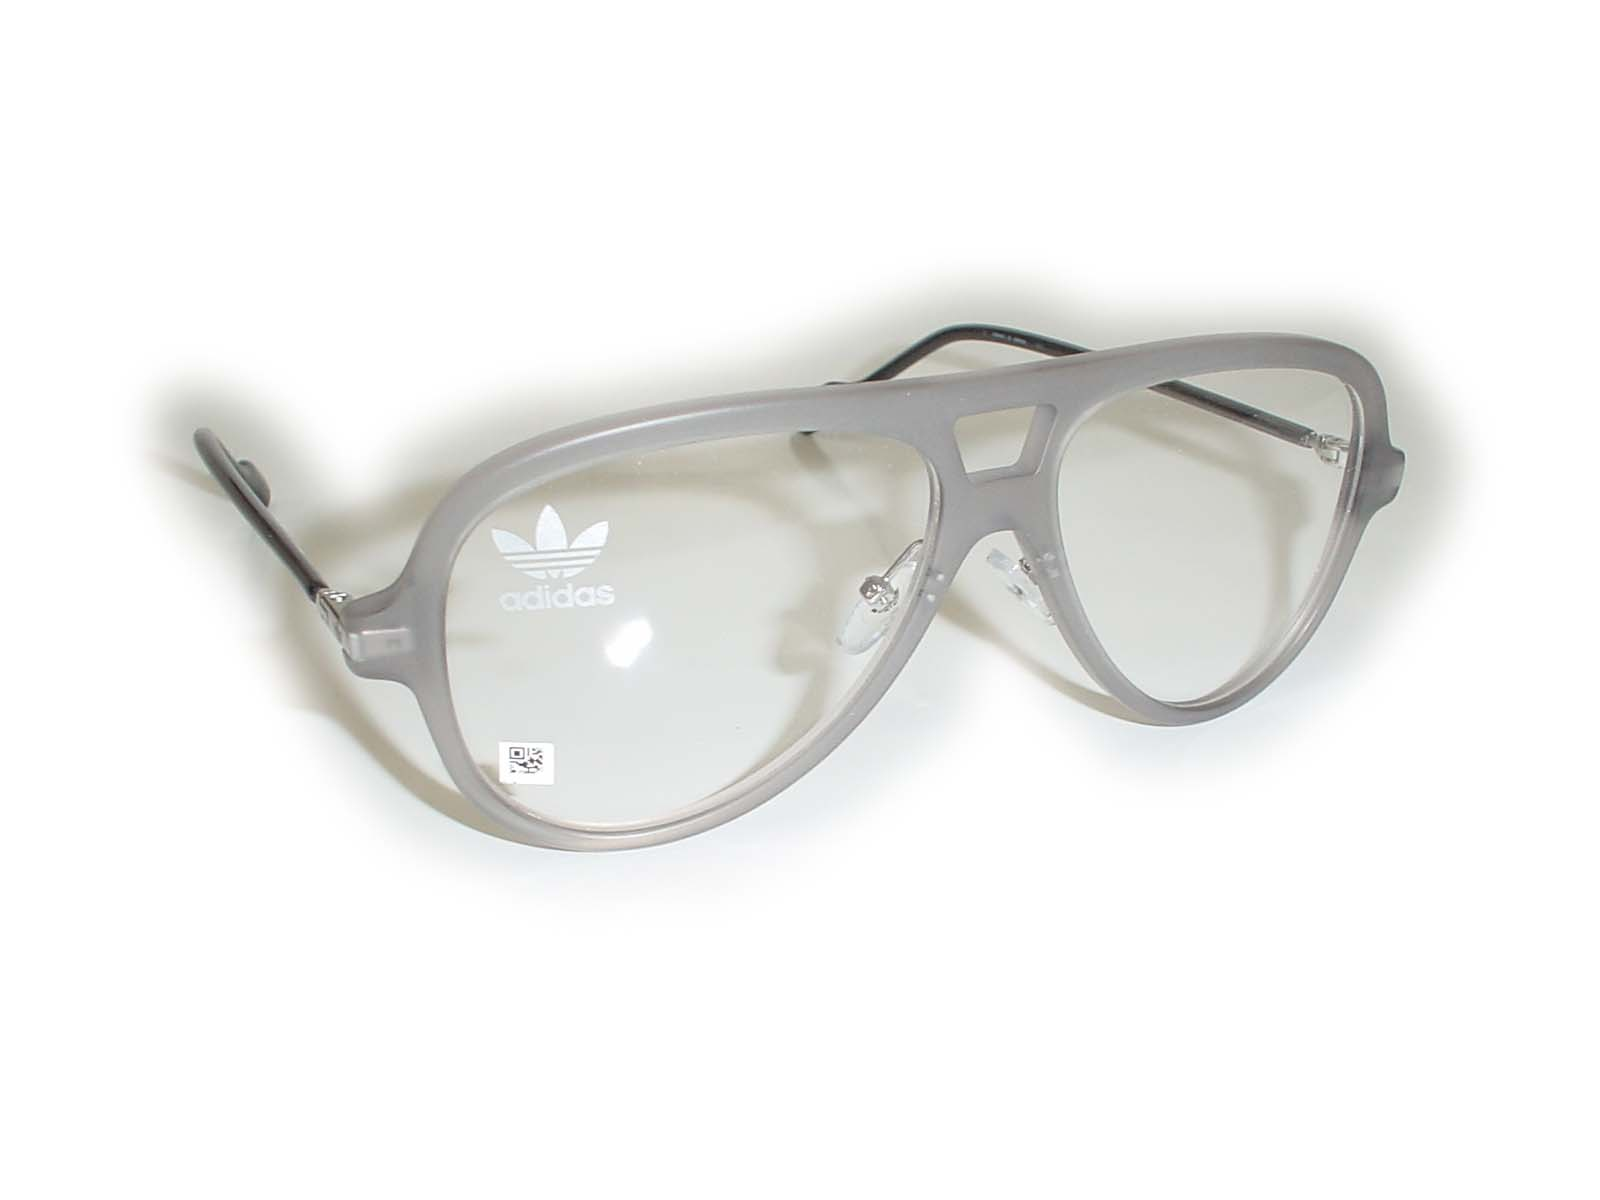 ★adidas(アディス)★AOK001057□14-145COL.070.000グレー超薄型非球面レンズ付